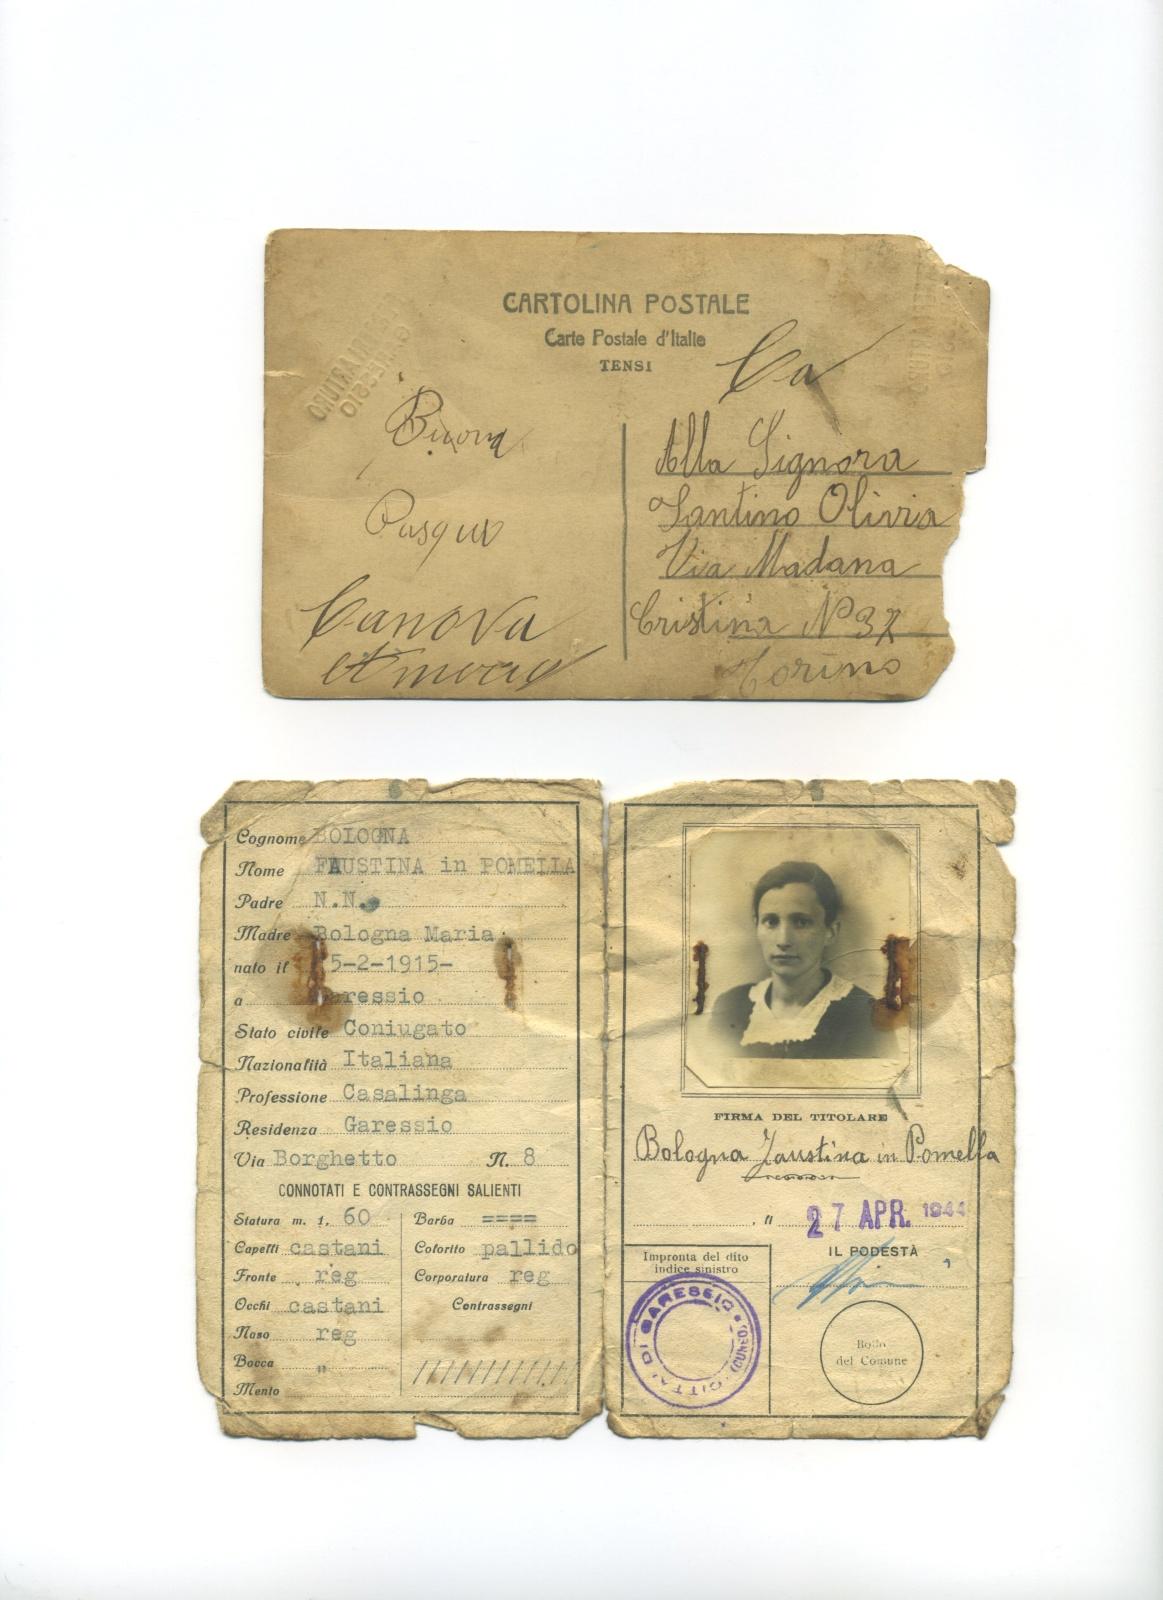 Bologna Faustina - 15/02/1915